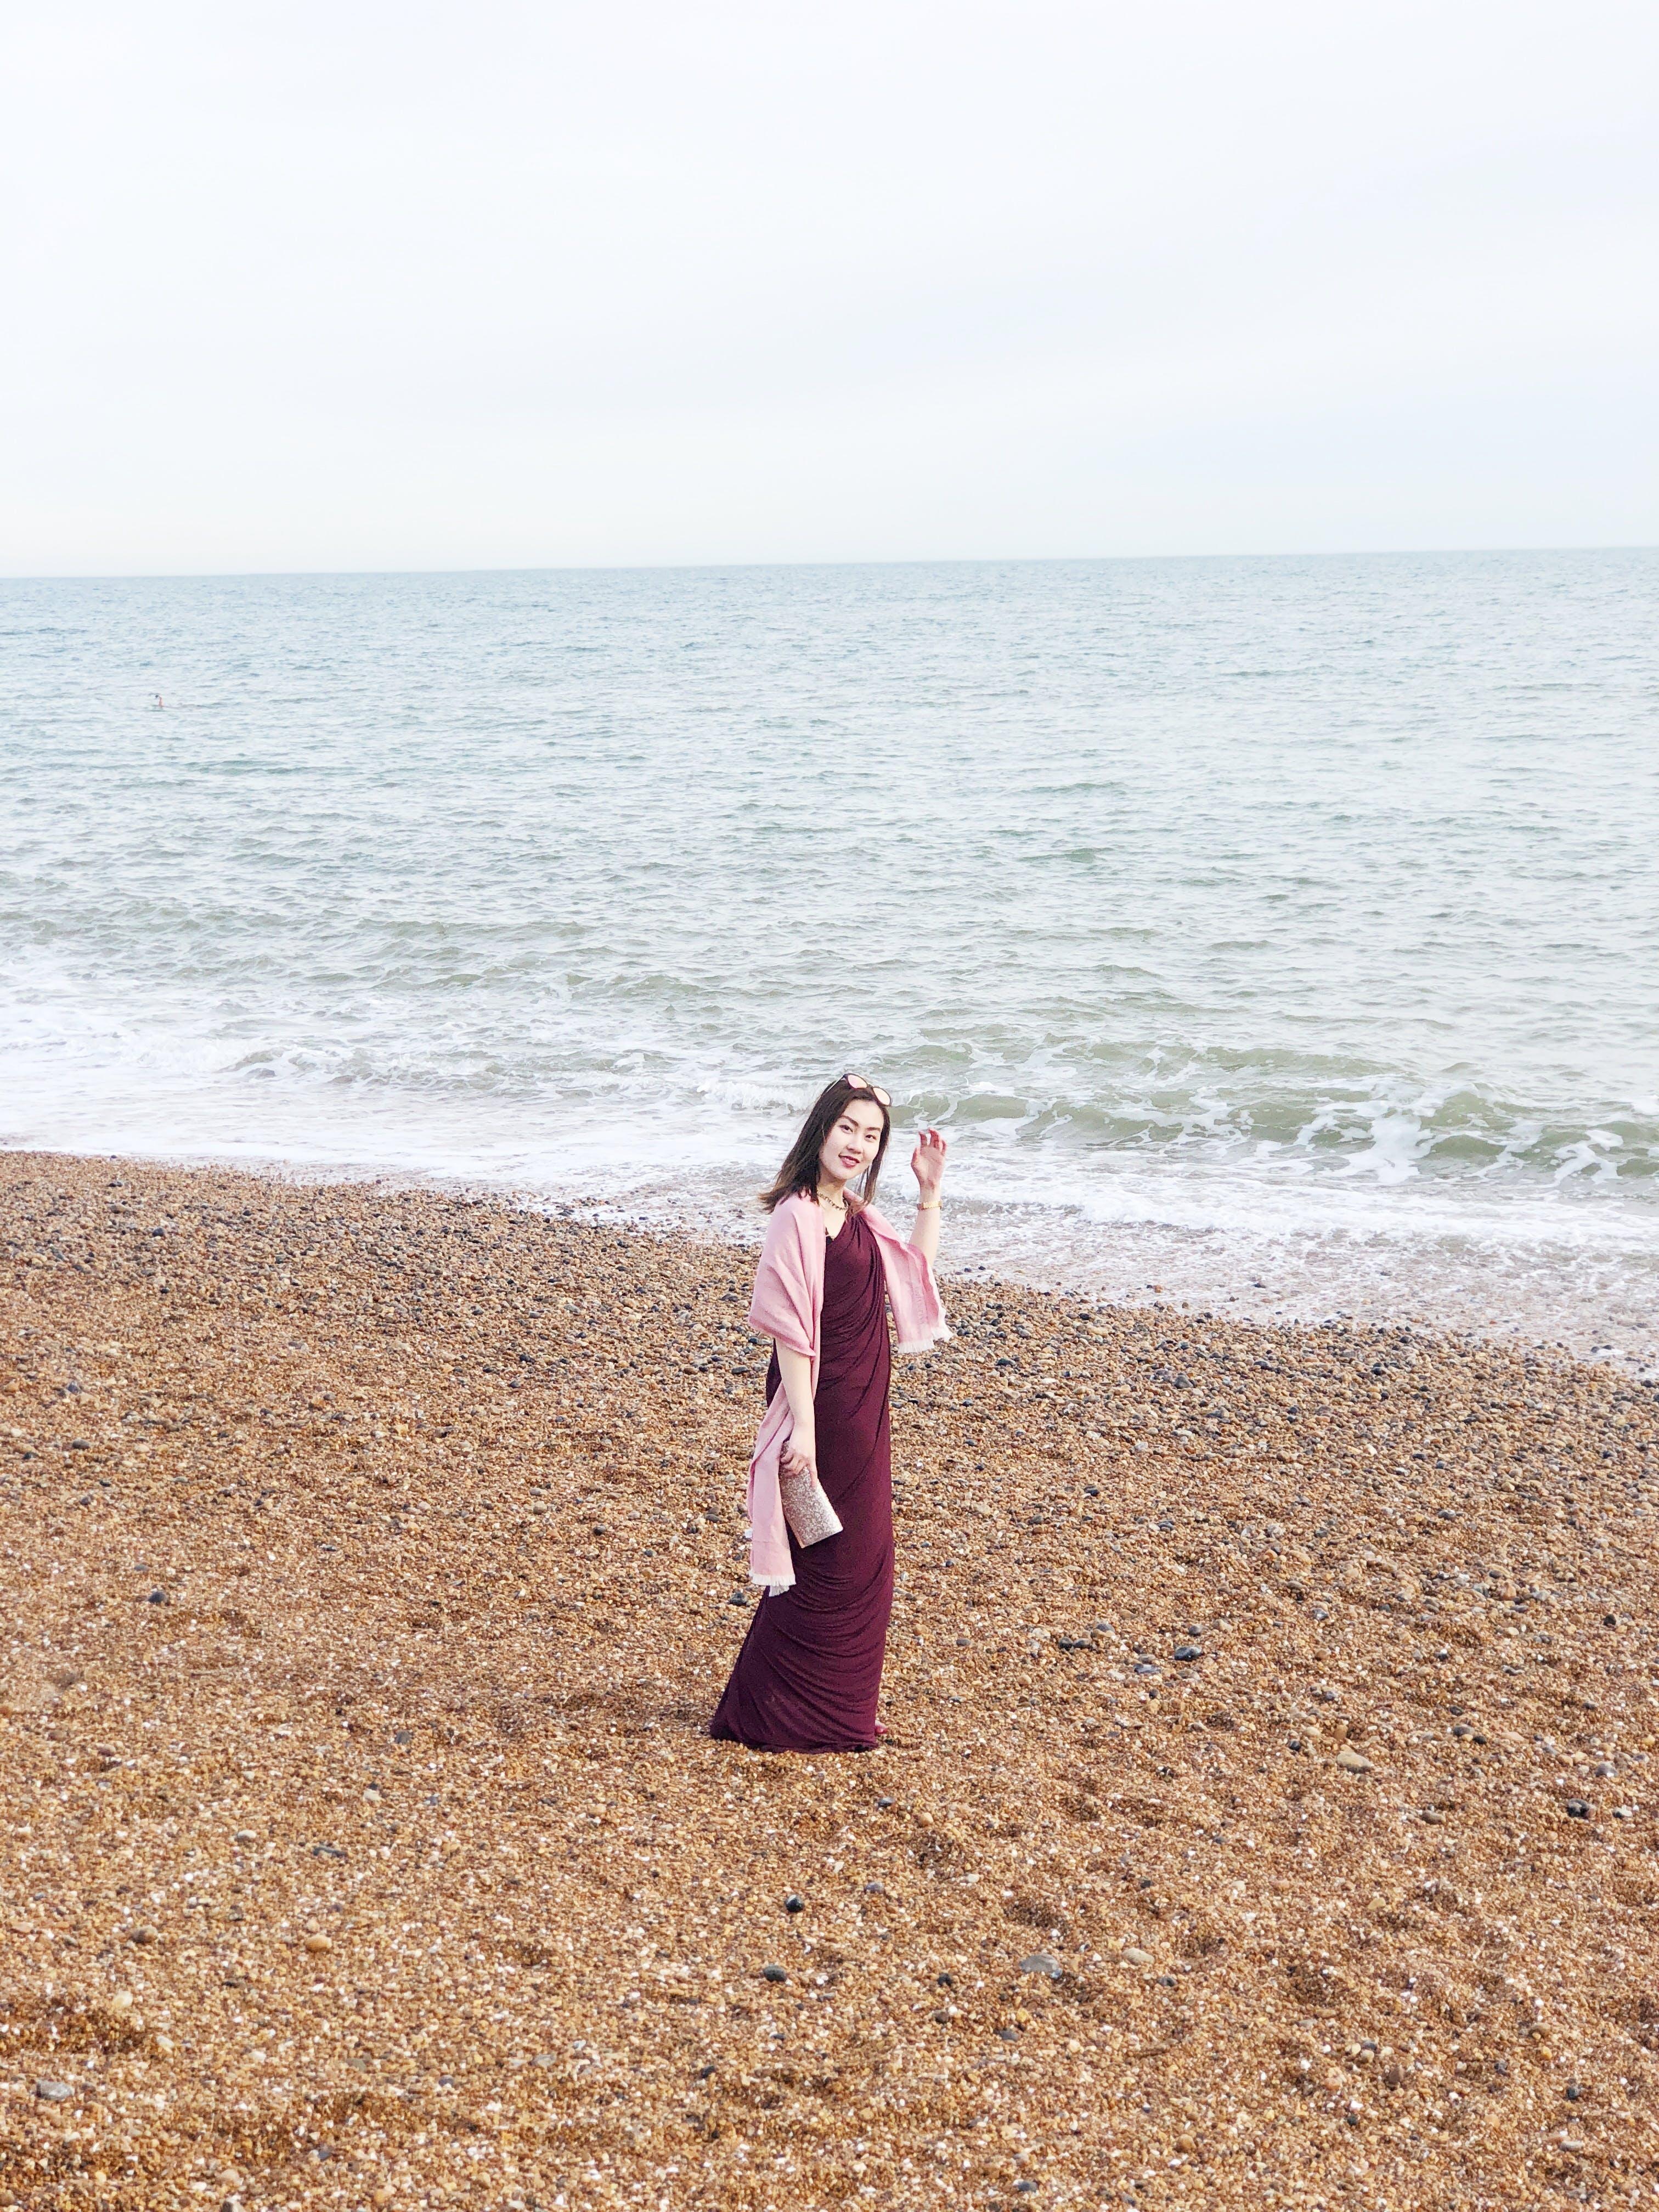 Woman Wearing Maroon Long Dress Near Seashore